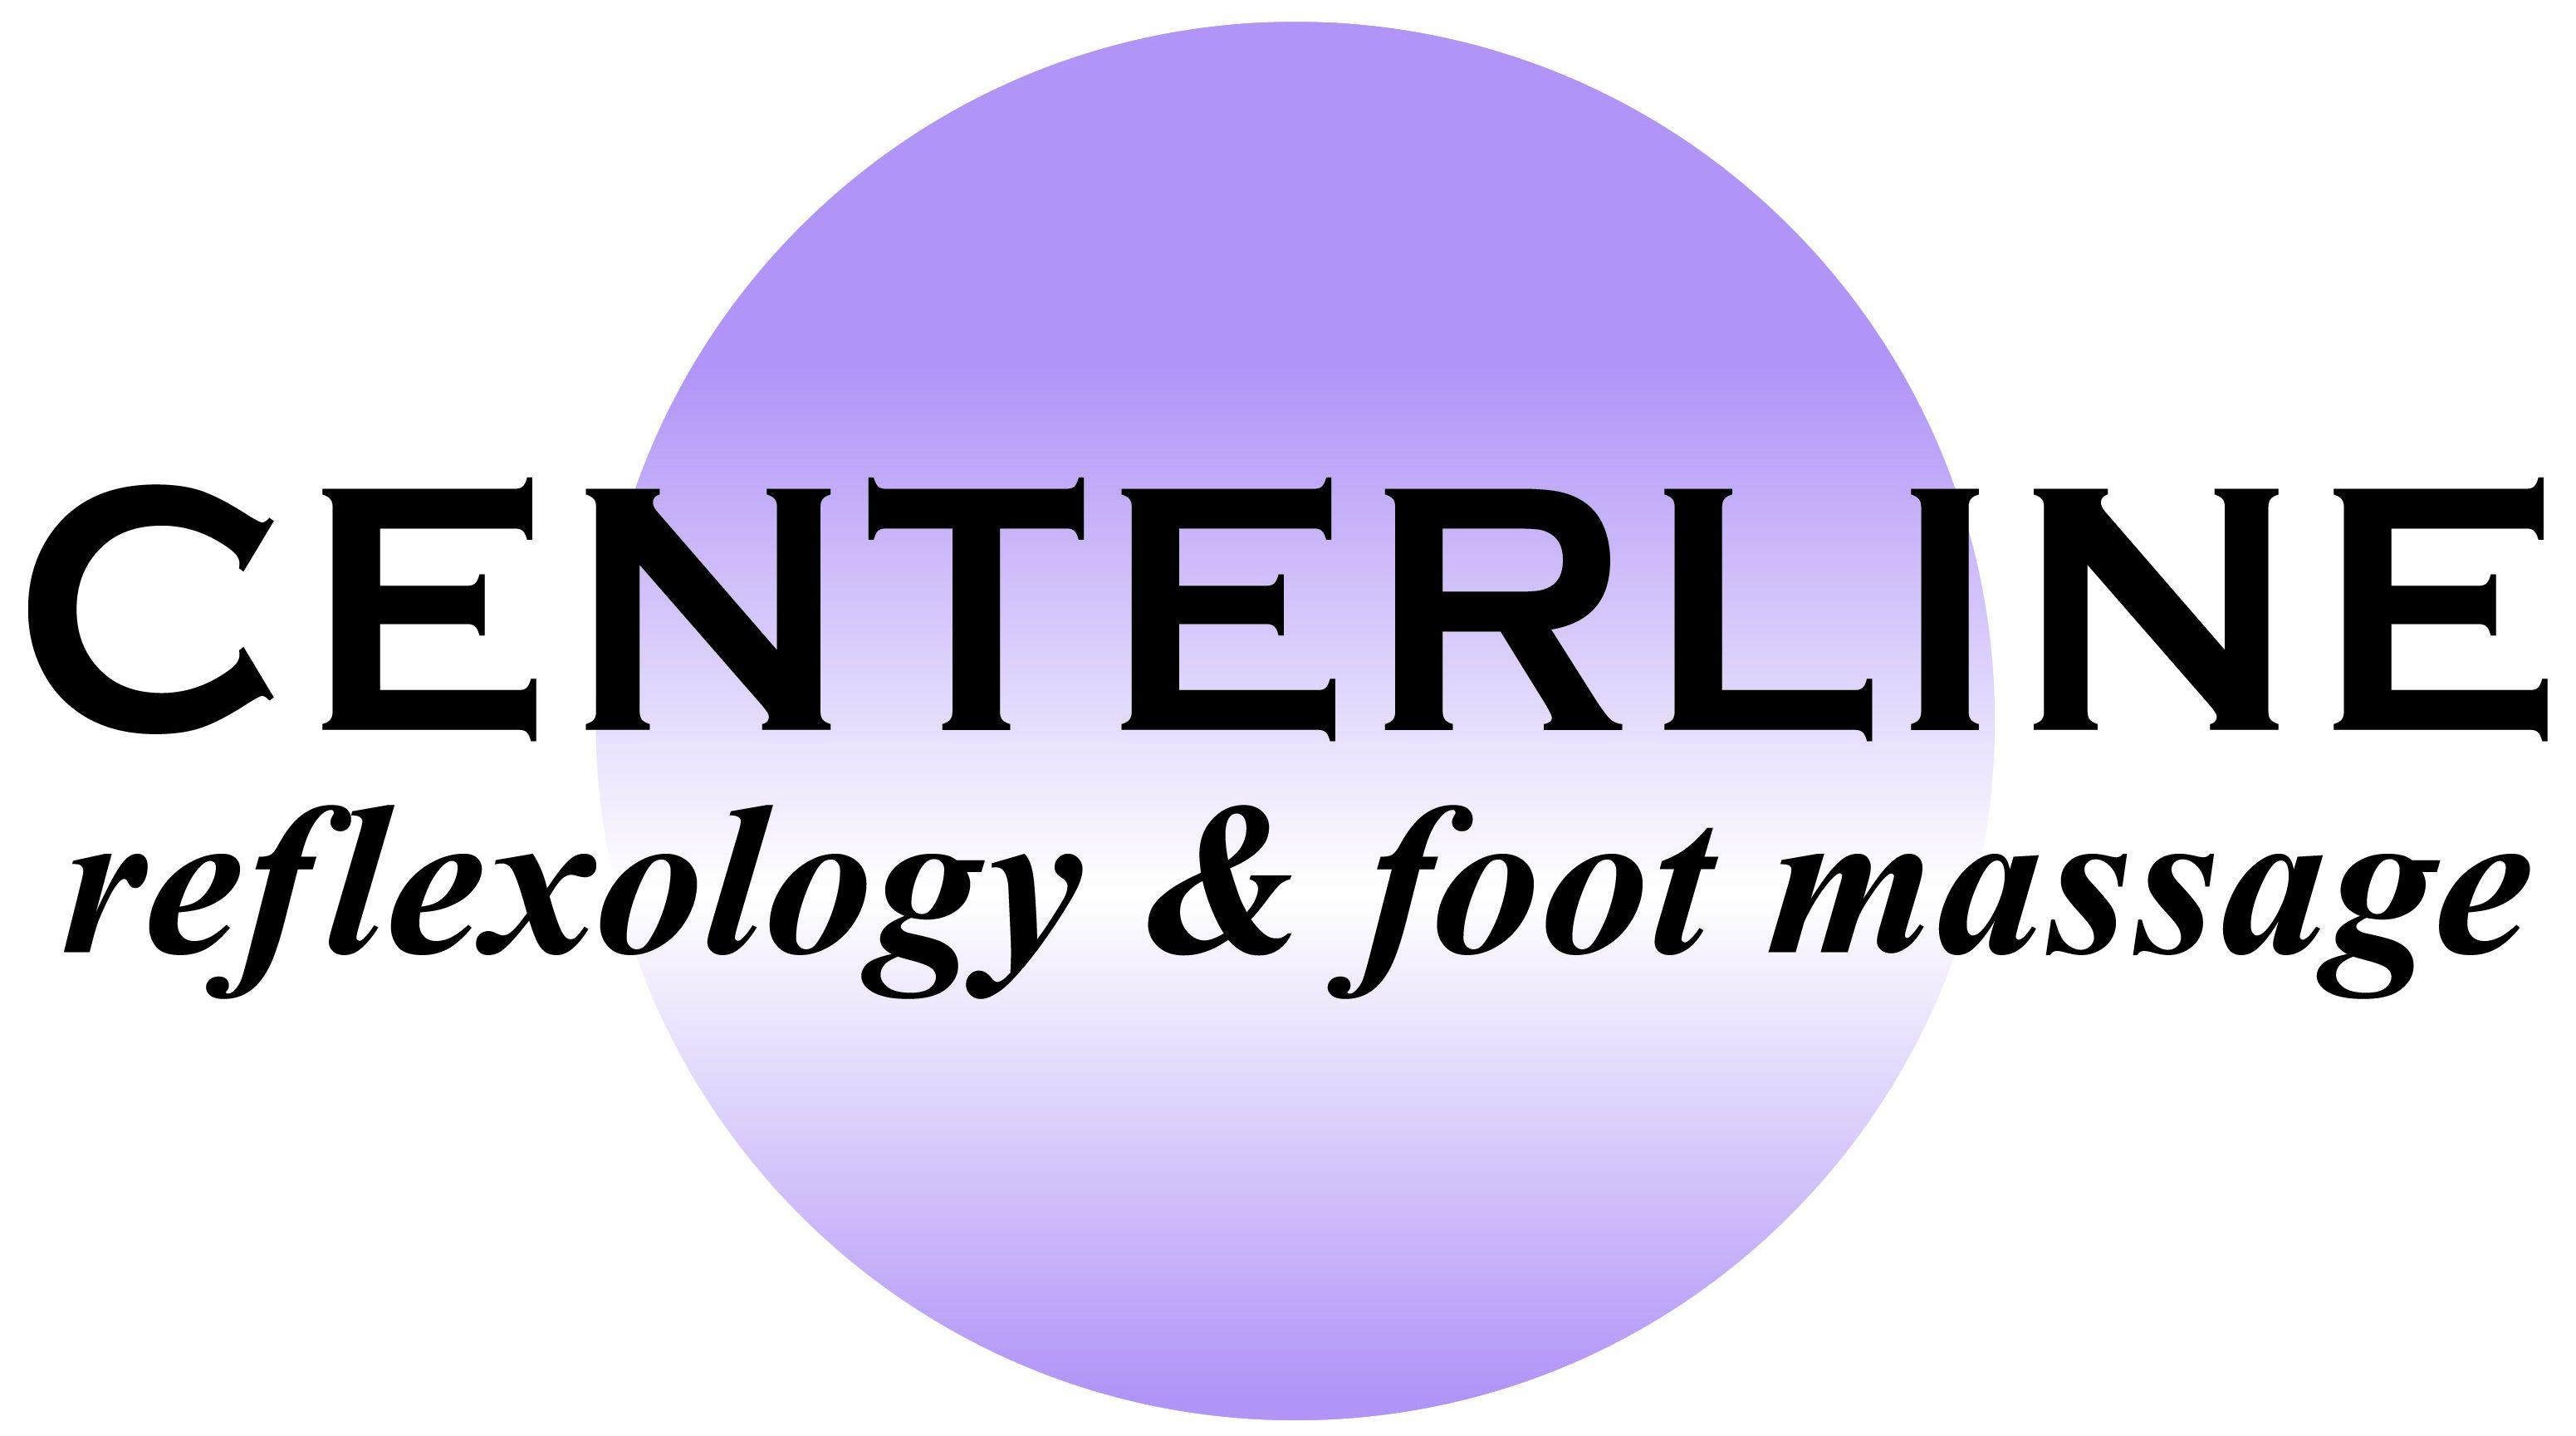 Centerline reflexology